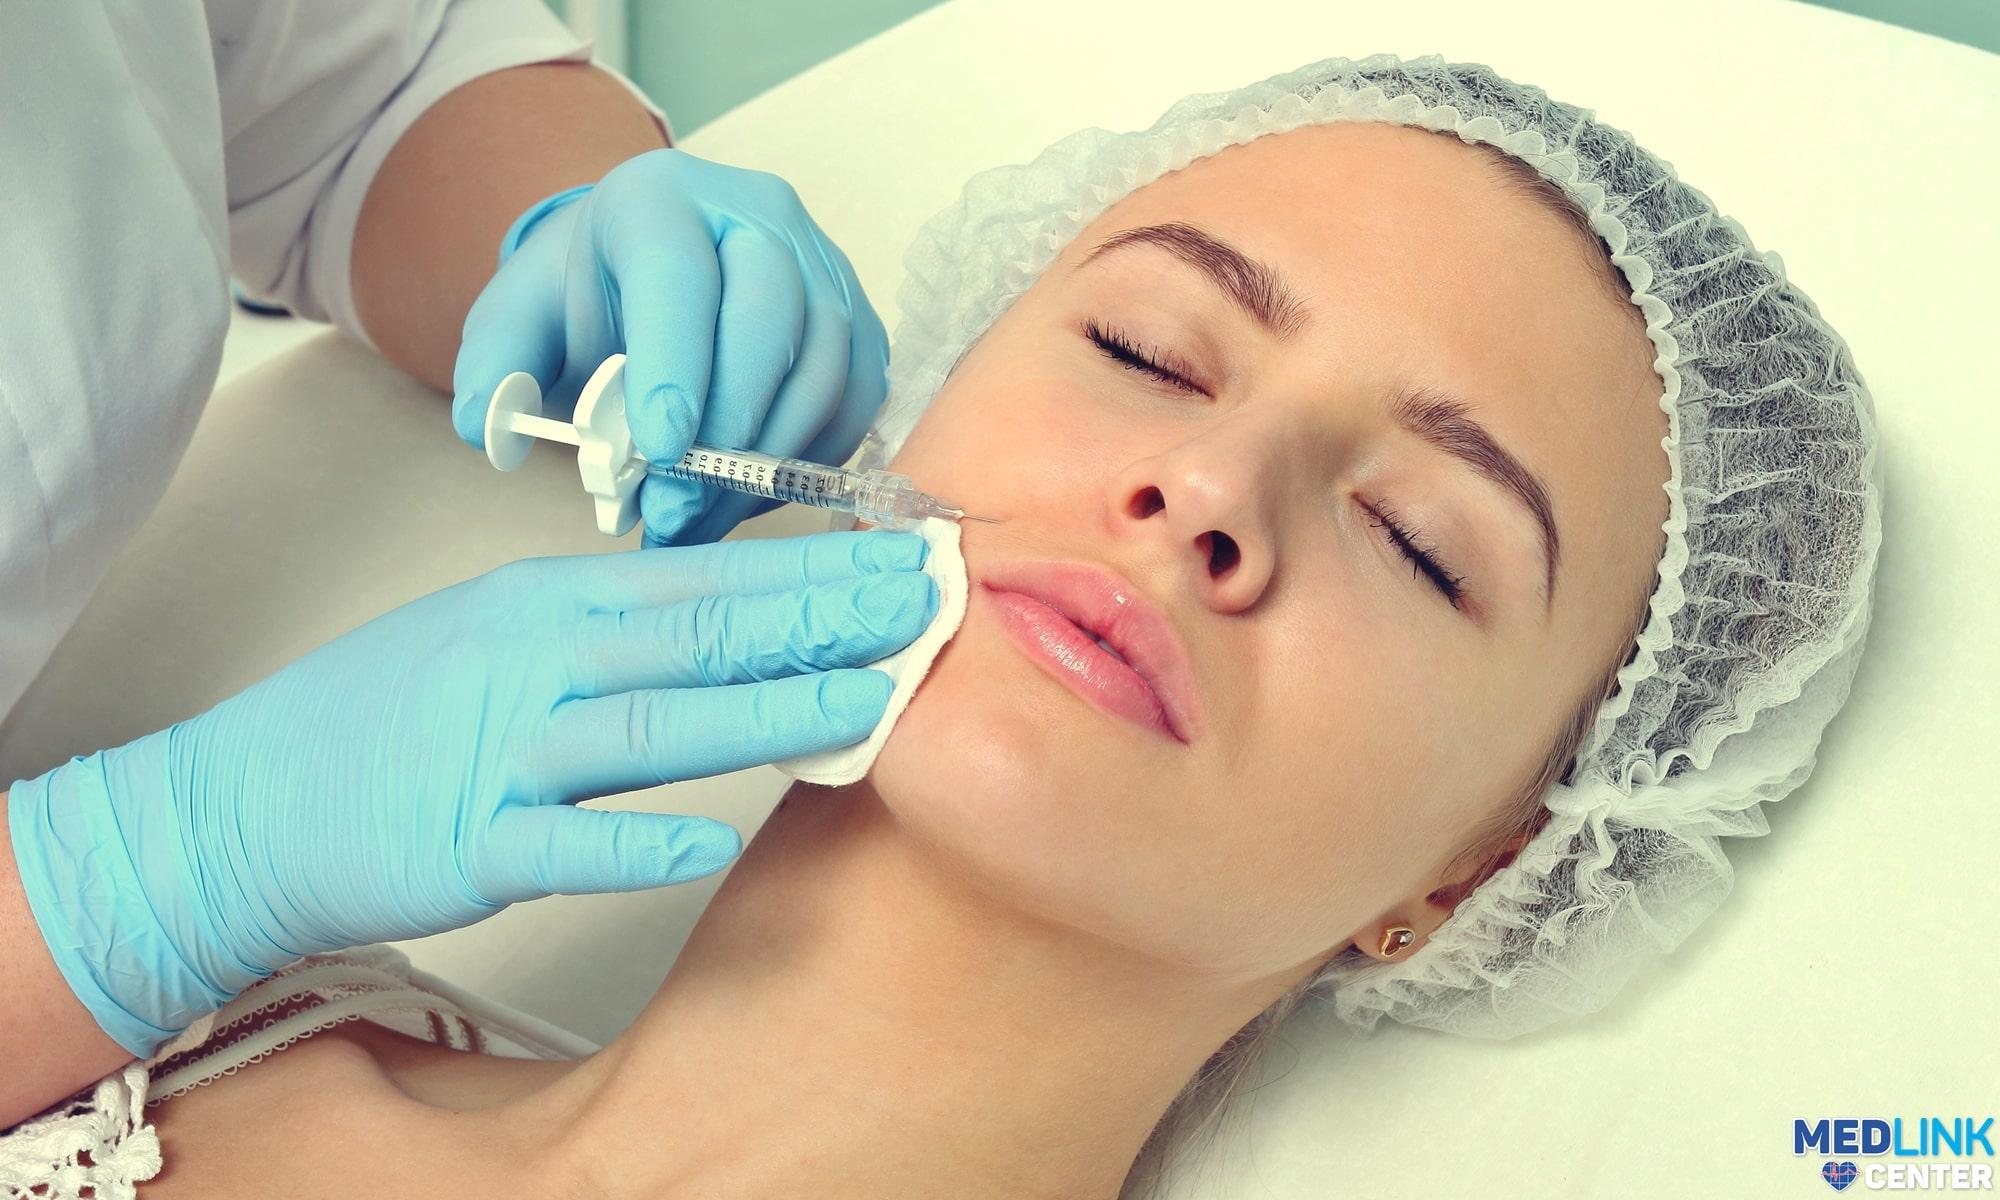 tratament botox riduri expresie aspect natural clinica medlink craiova